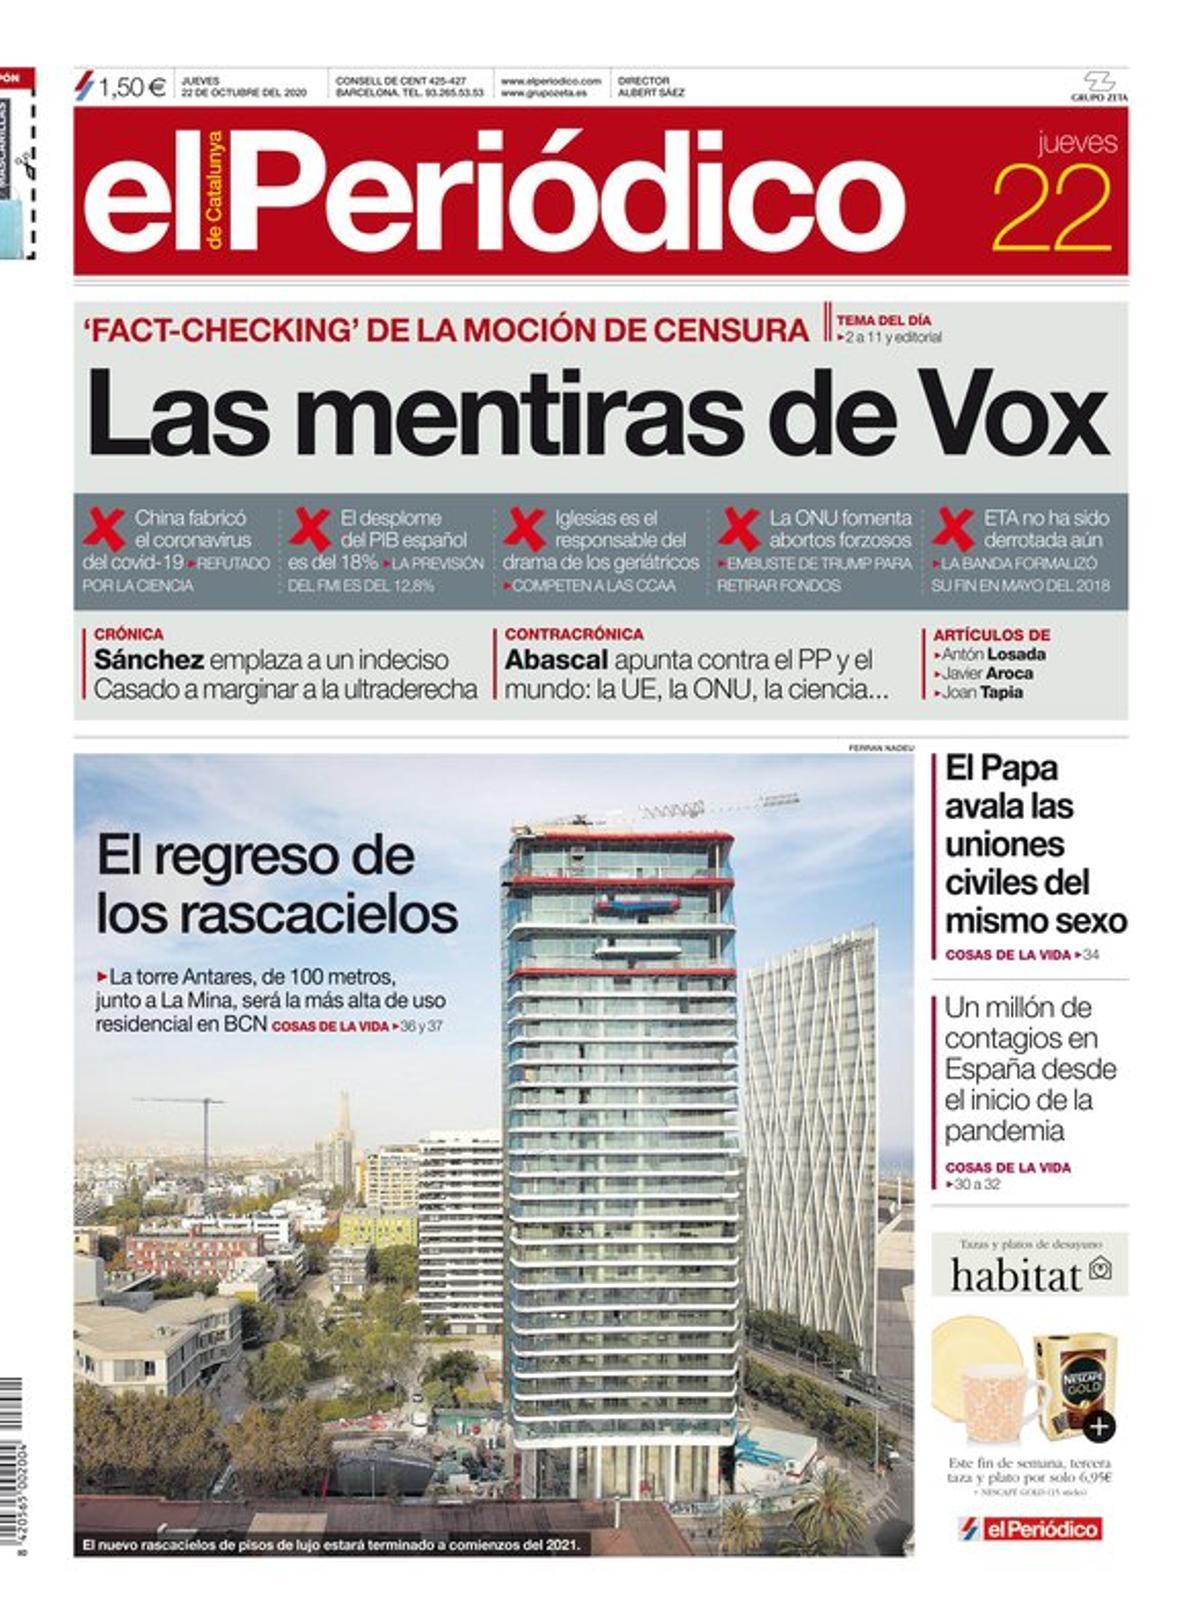 La portada de EL PERIÓDICO del 22 de octubre del 2020.